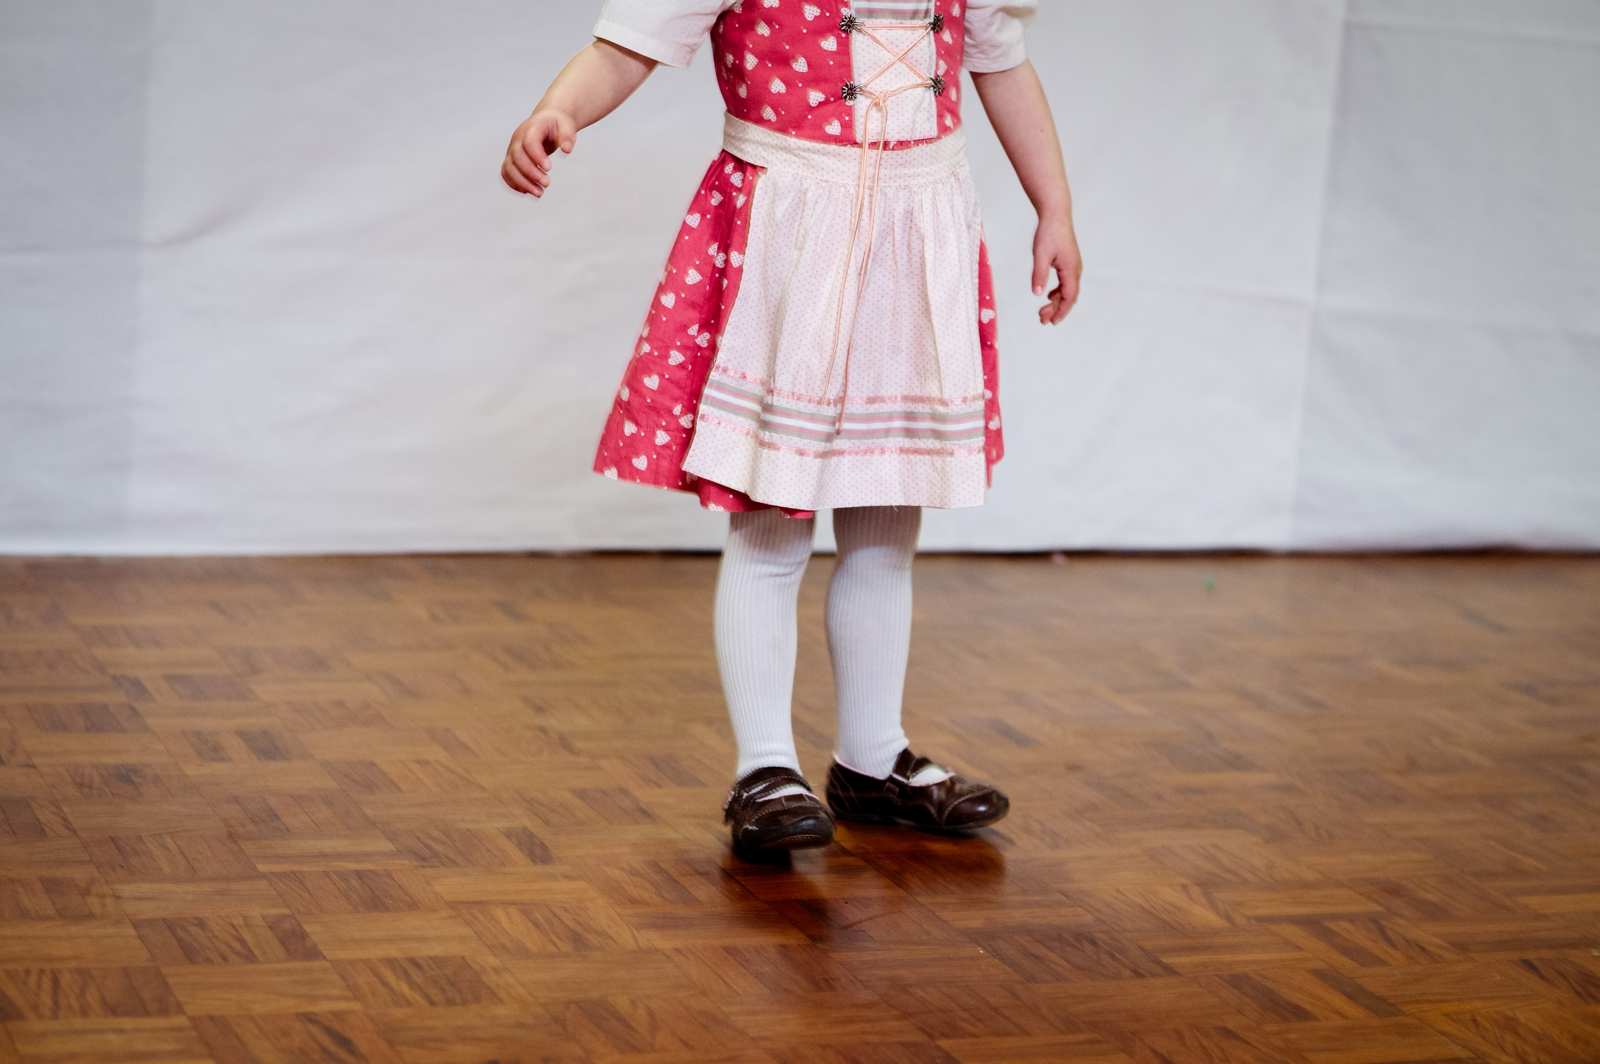 German child